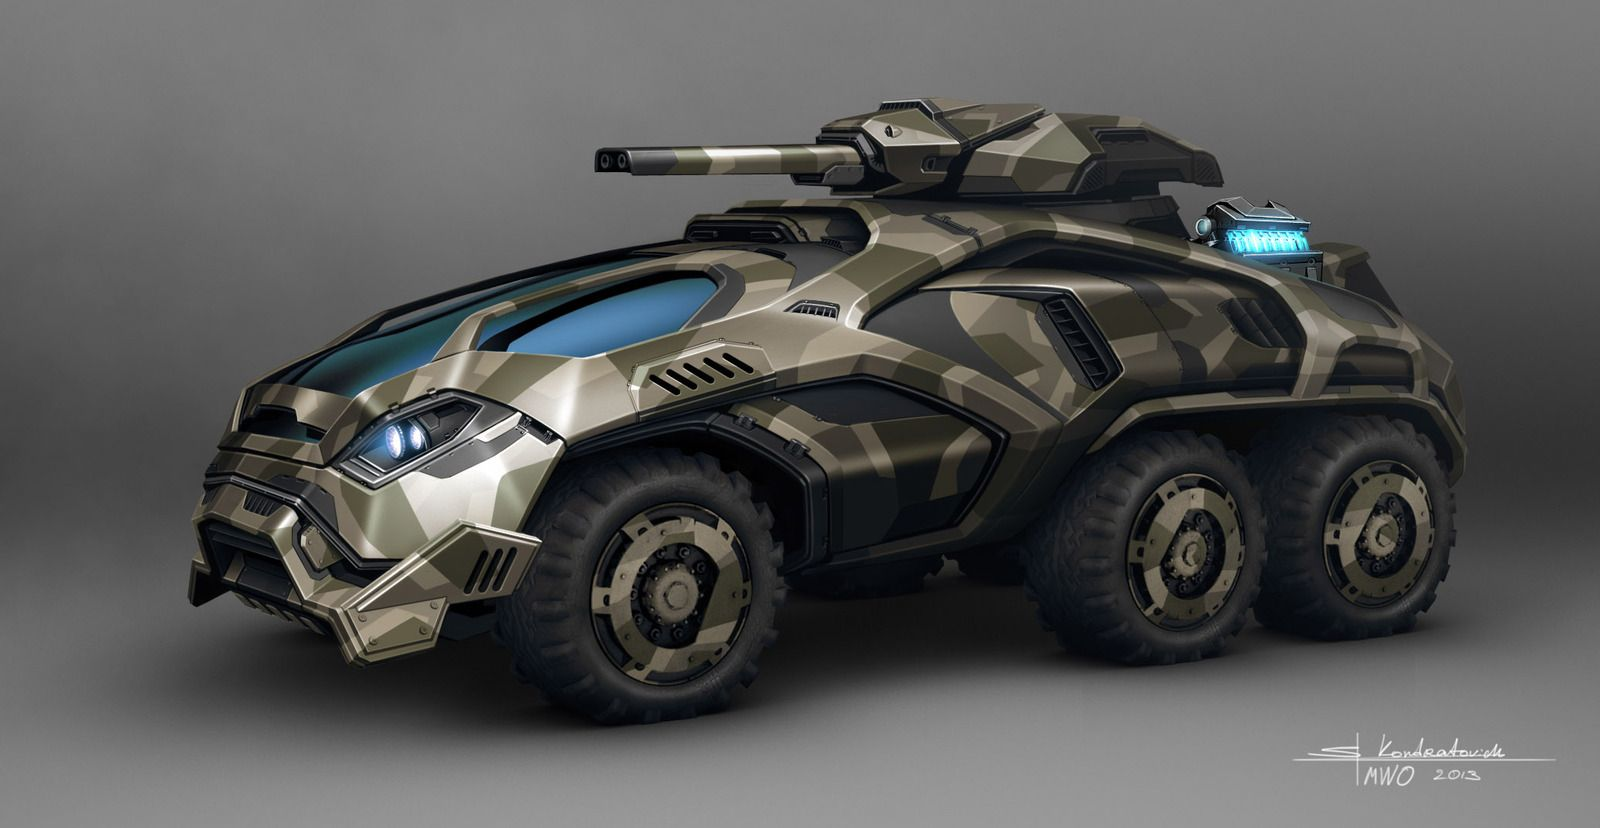 1600x828_19056_MWO_army_vehicle_concept_art_9_2d_sci_fi ...